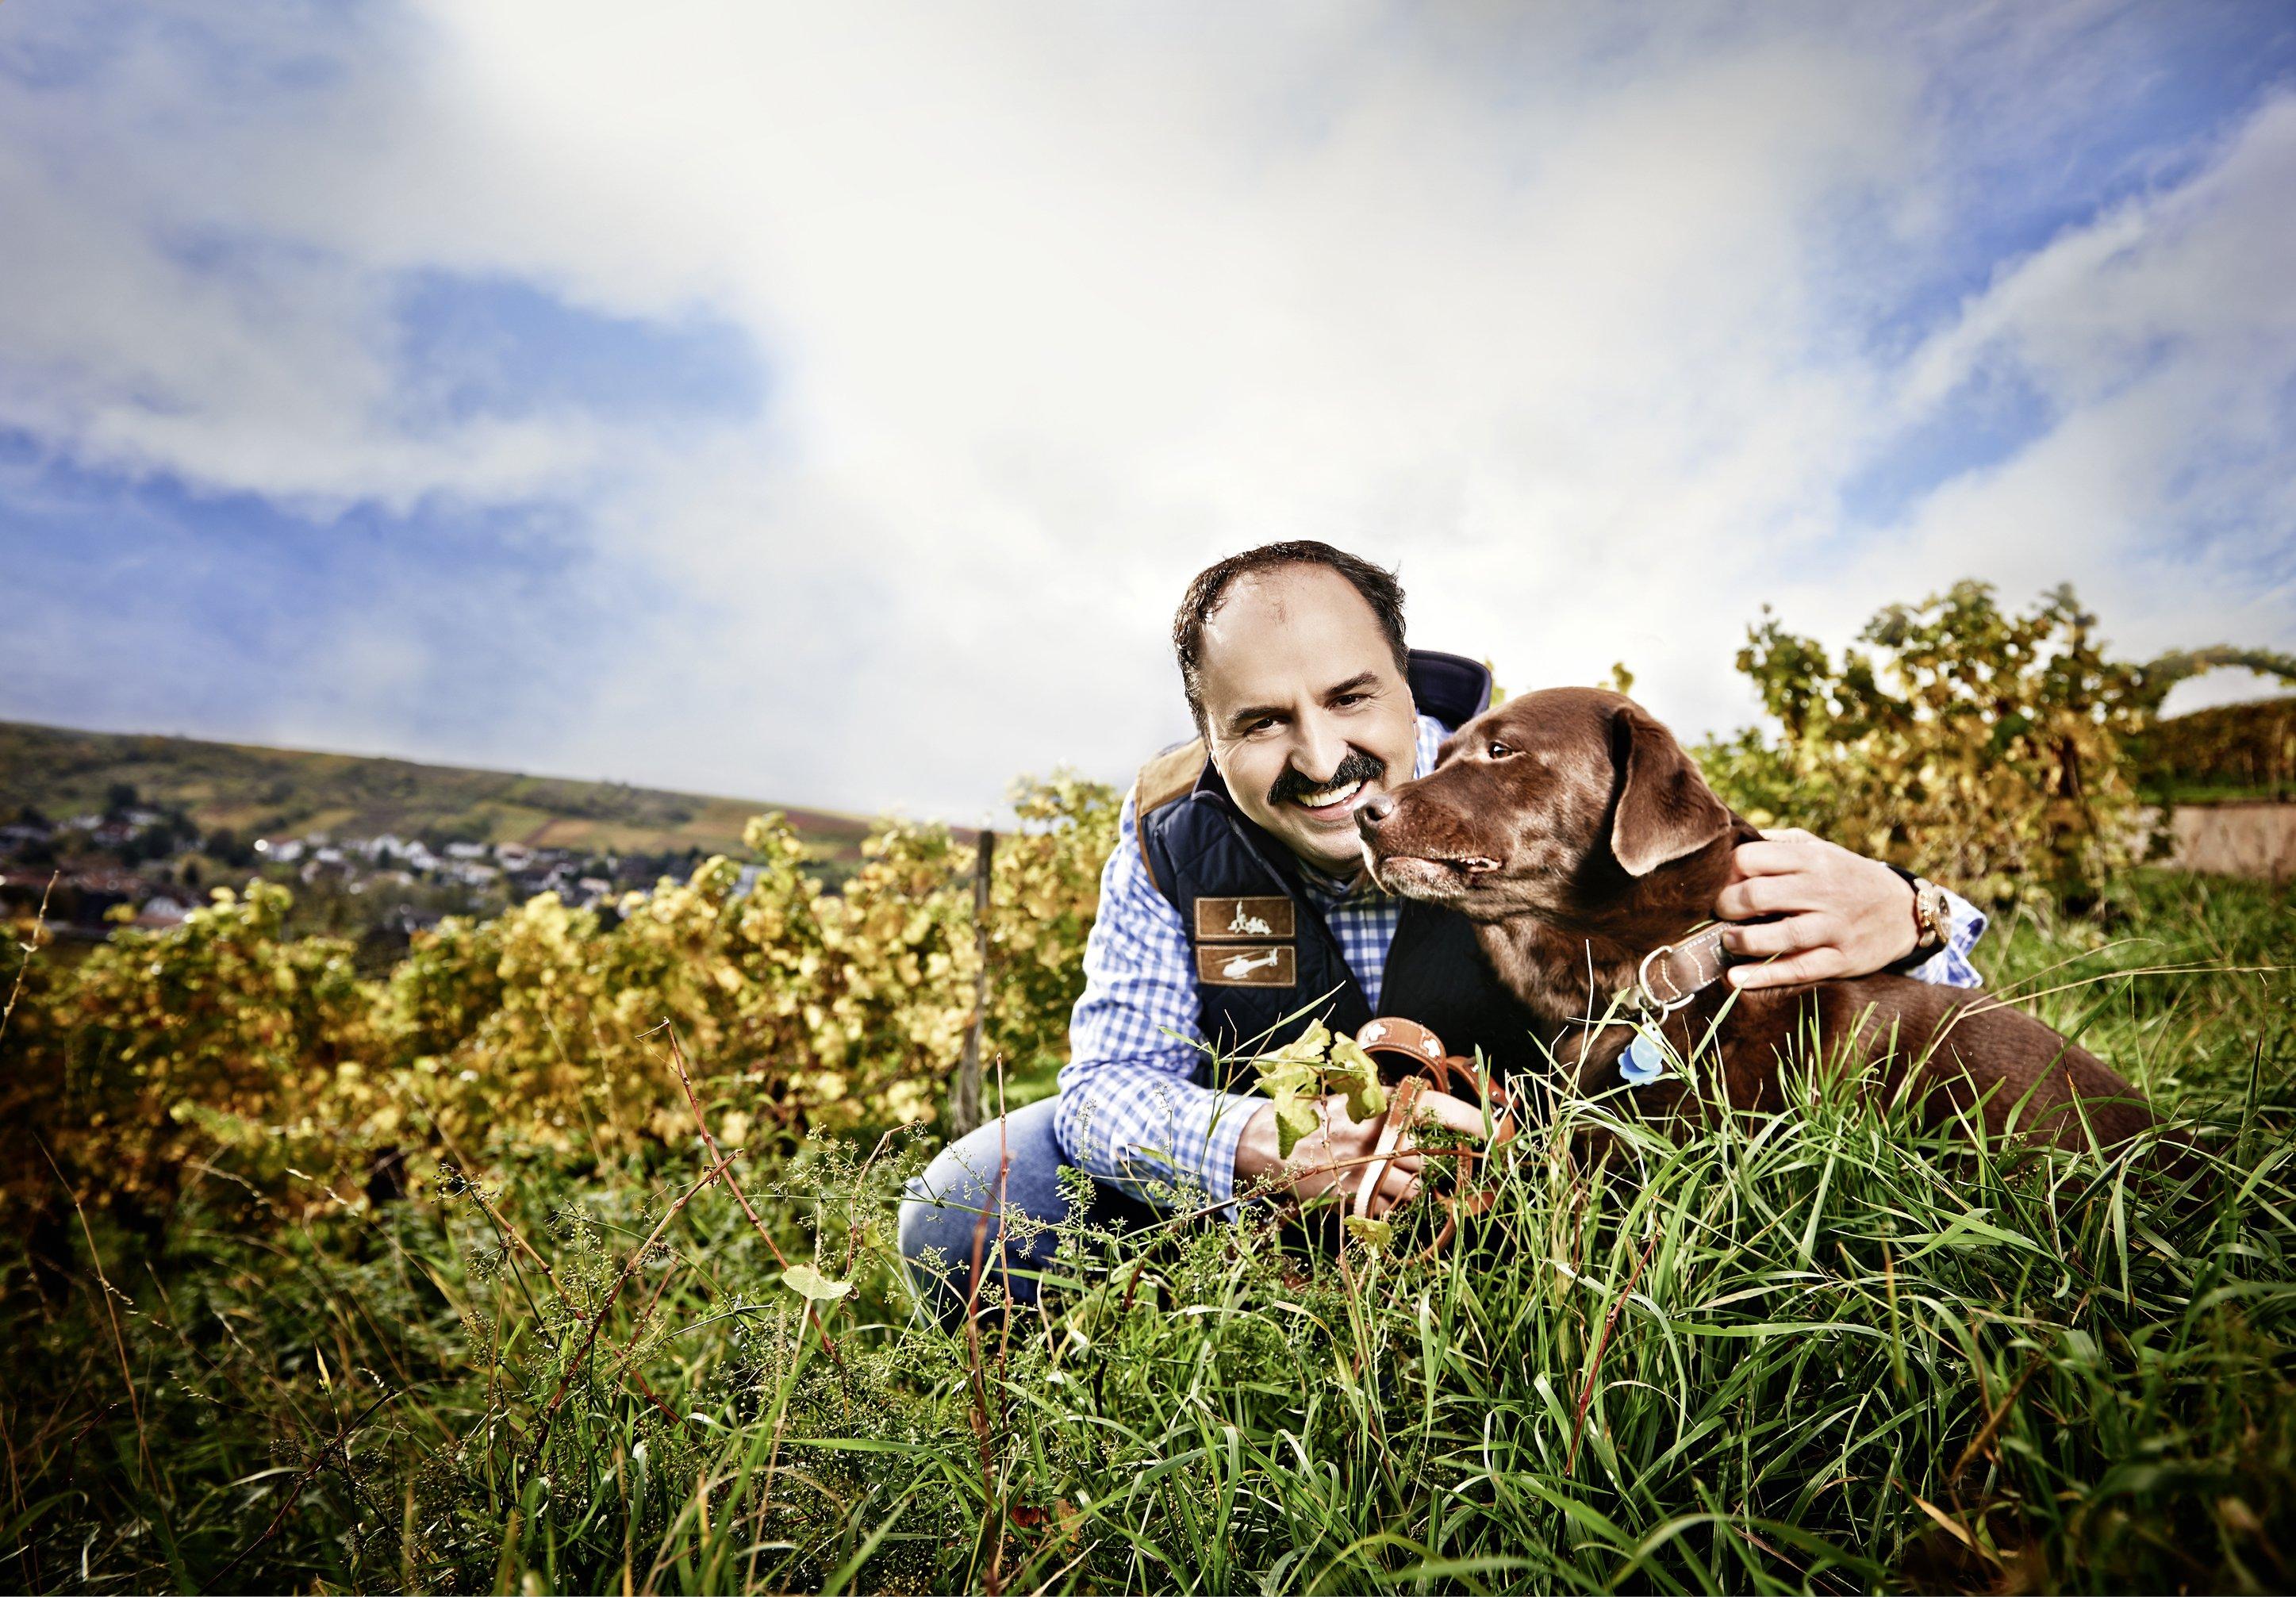 johann-lafer-und-sein-hund-fuer-charity-buch-prominent-mit-hund-foto-nikolaj-georgiew-www.misterspencer.de